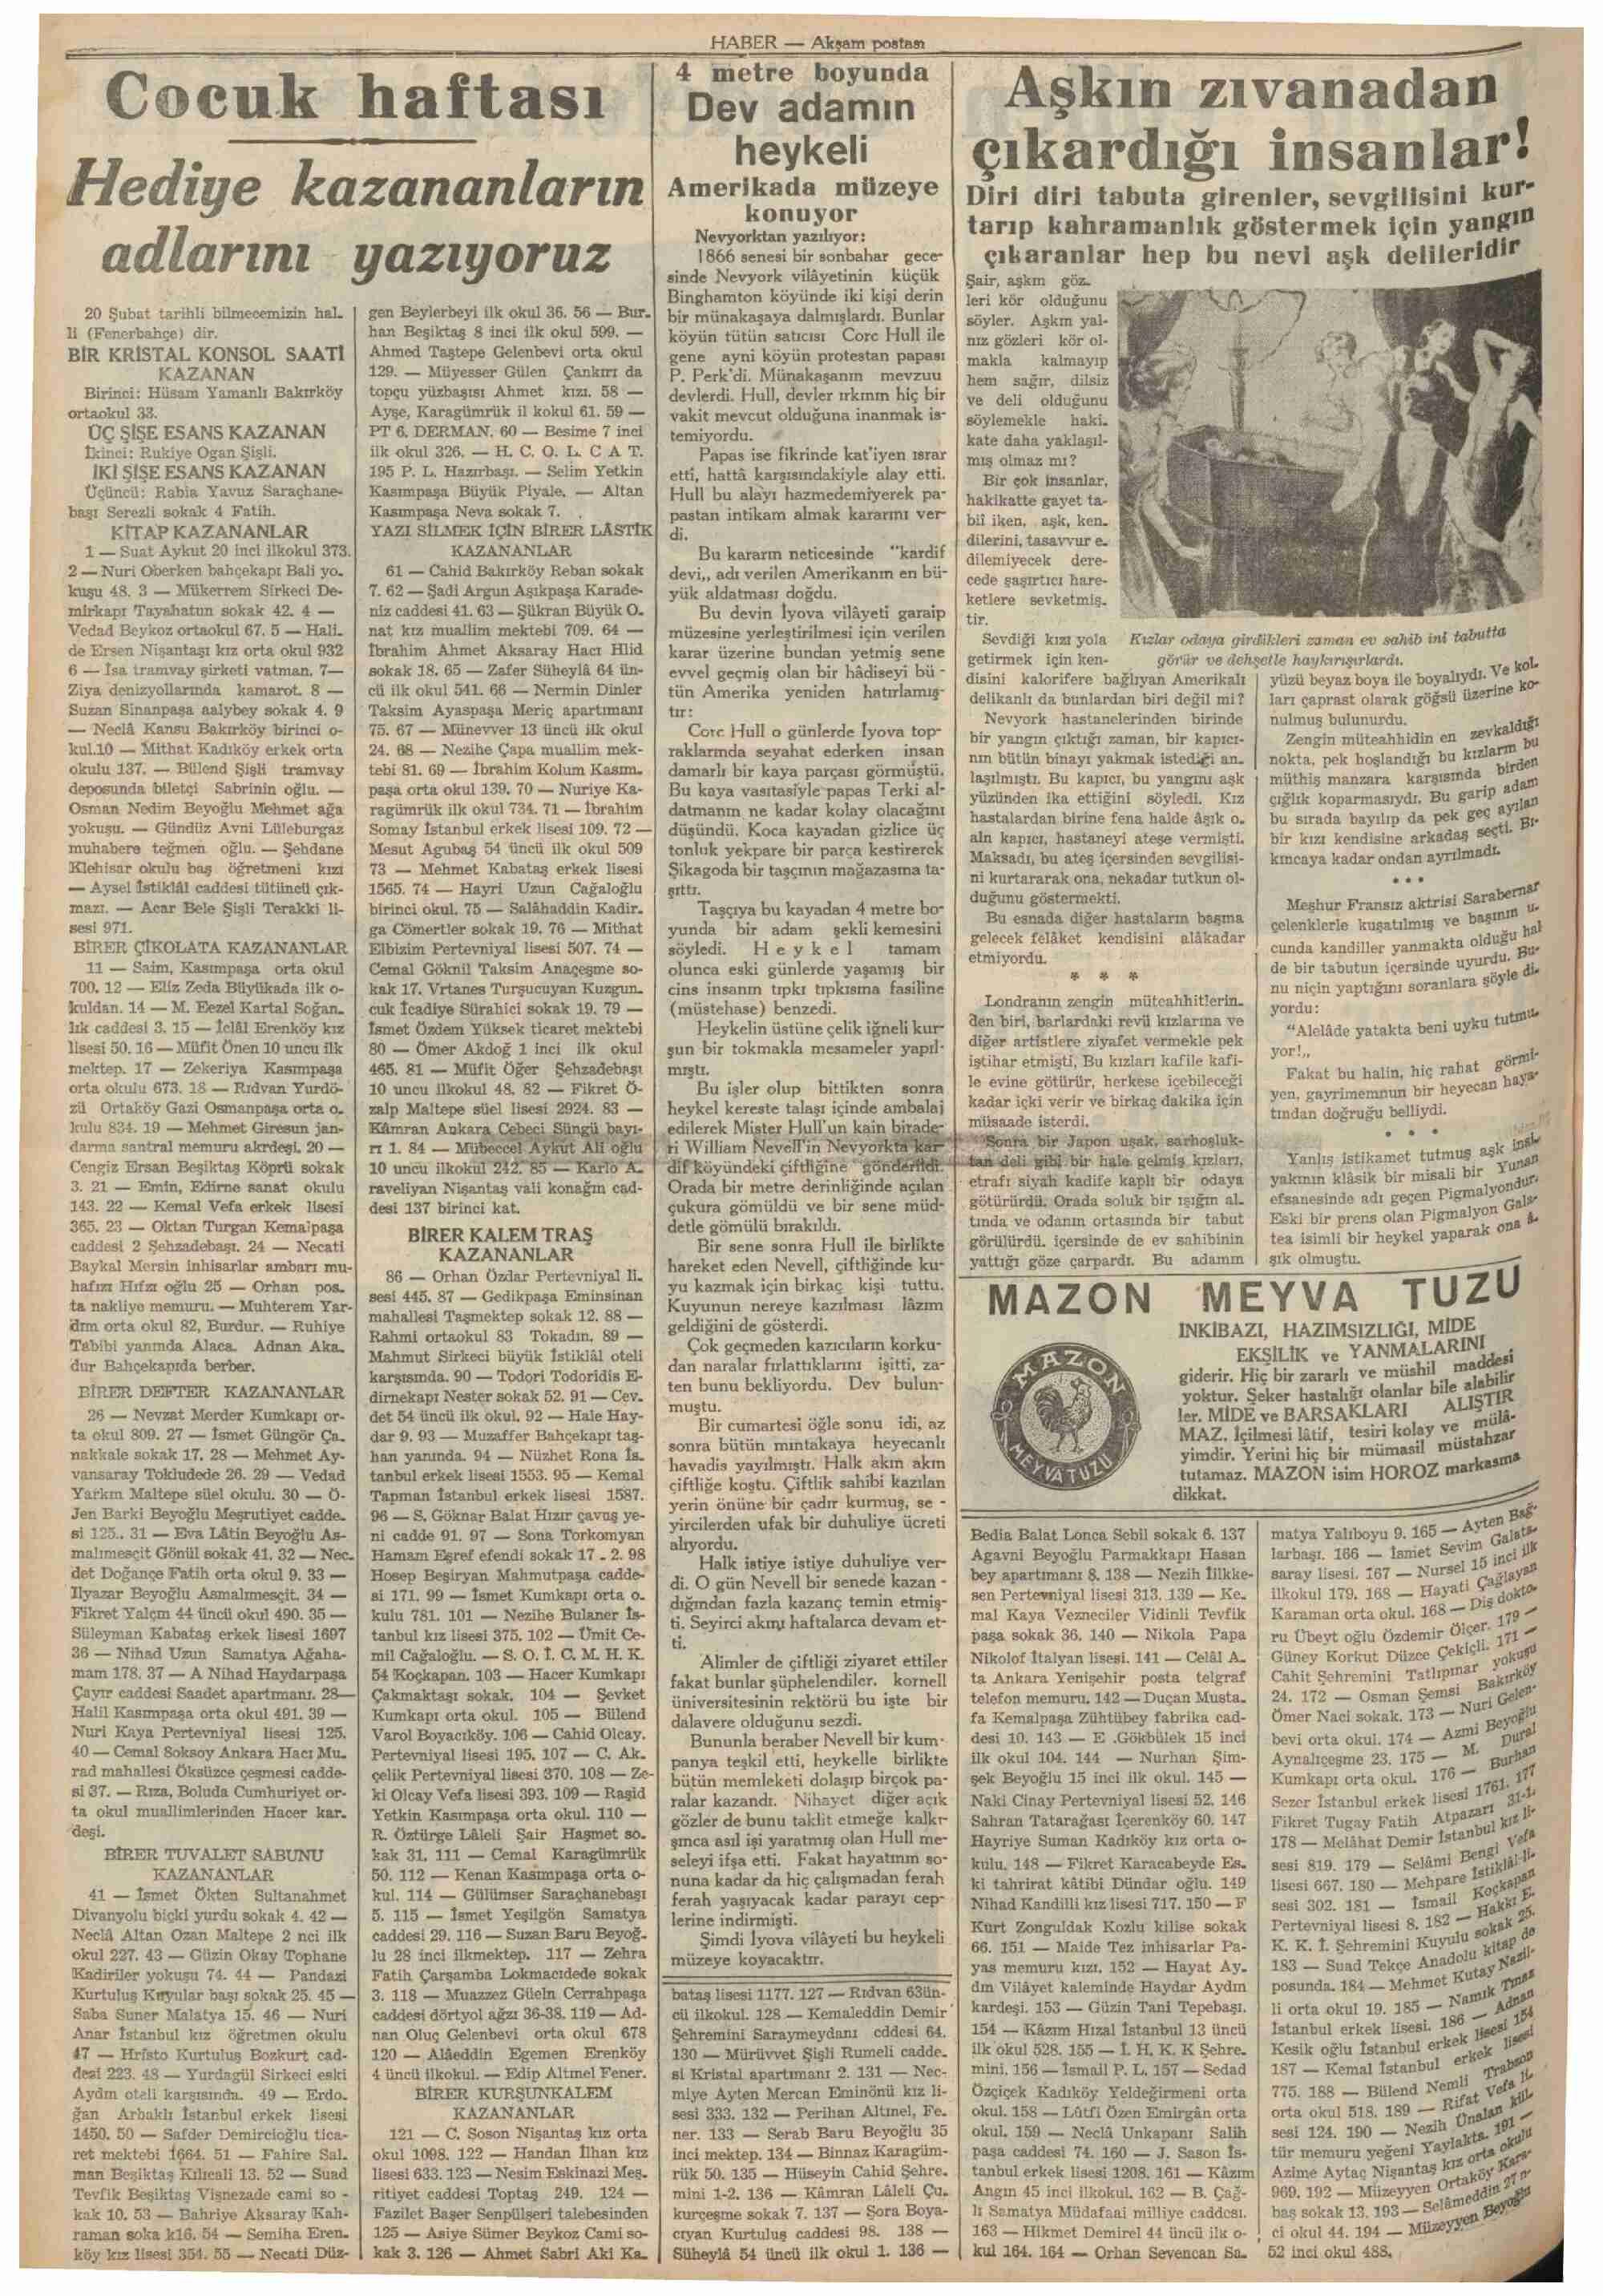 11 Mart 1937 Tarihli Haber Dergisi Sayfa 10